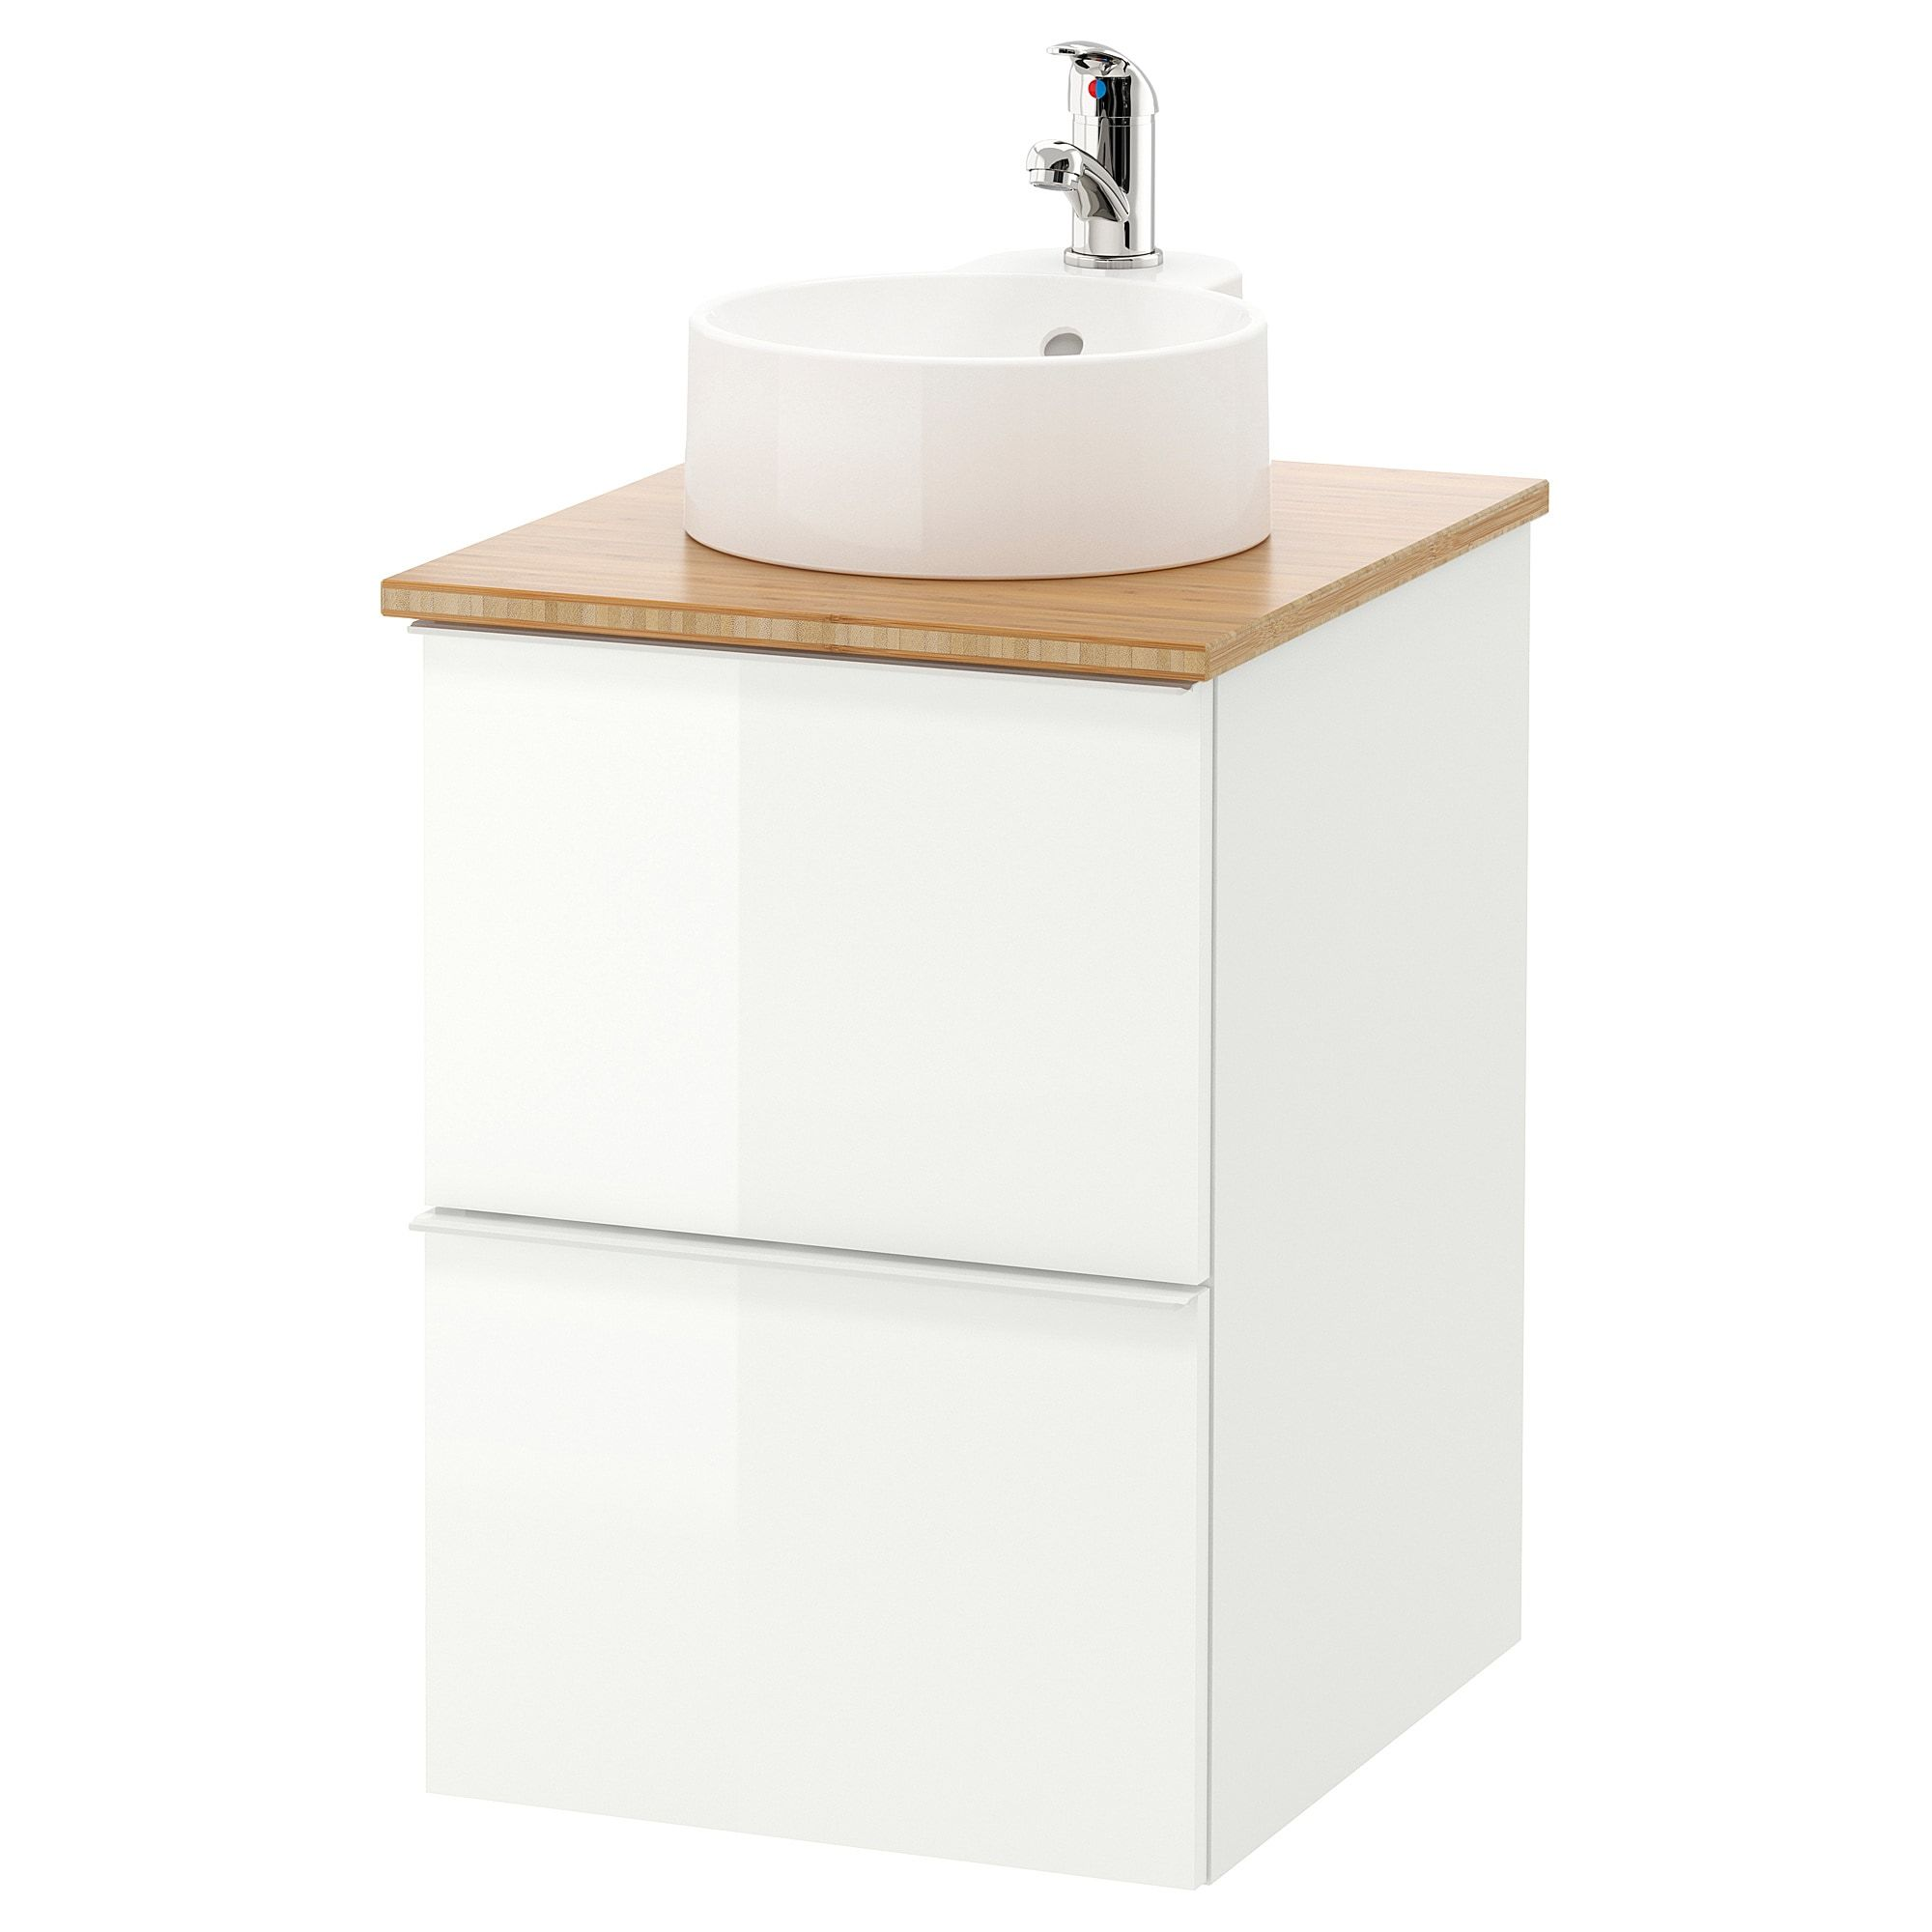 Ikea Oficialnyj Internet Magazin Mebeli Ikea Godmorgon Wash Basin Cabinet Basin Cabinet